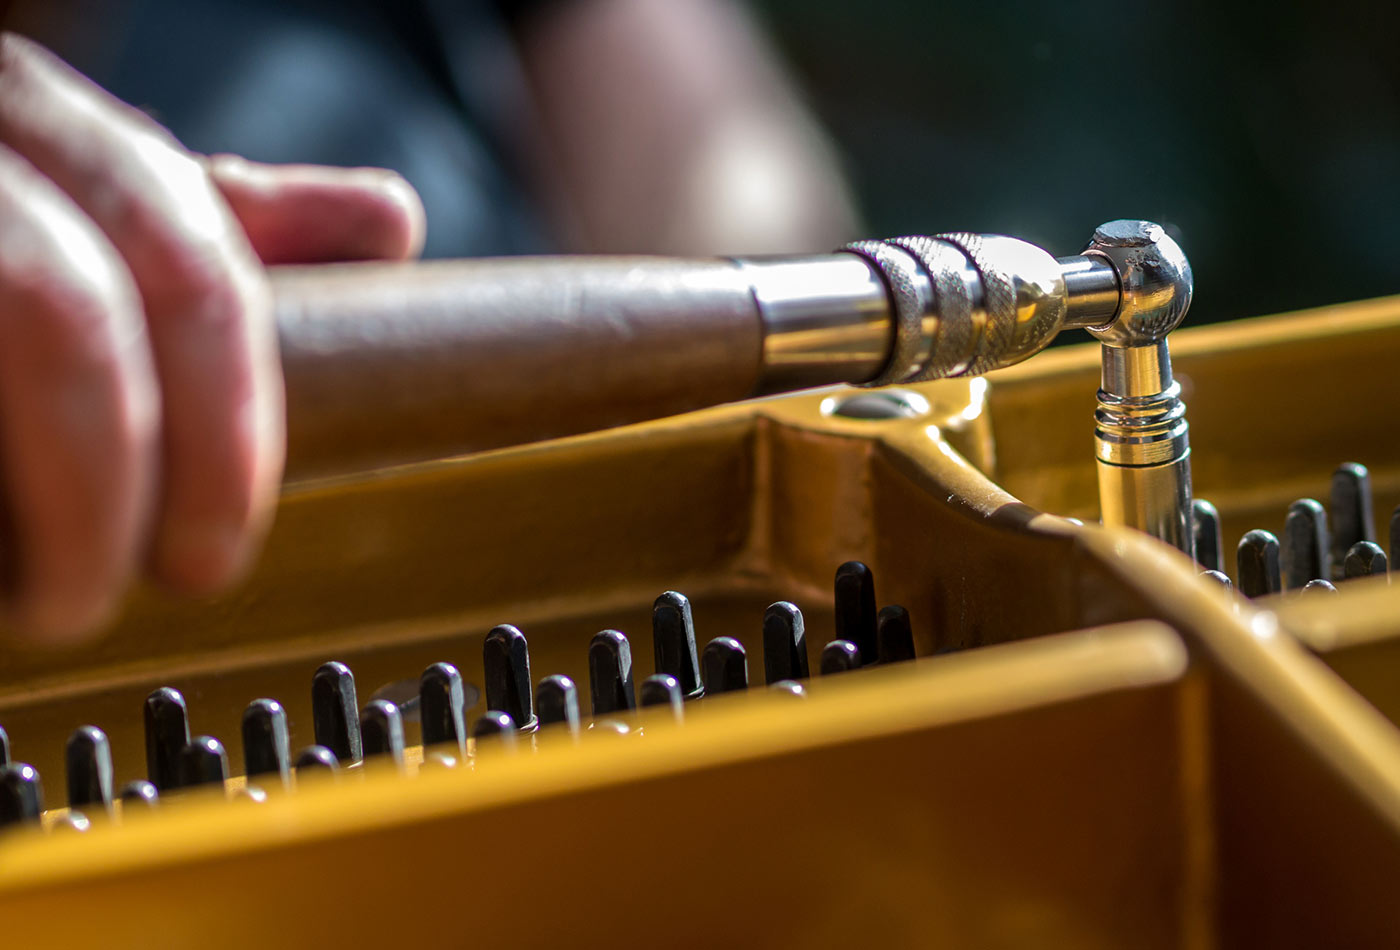 Tuning a grand piano.